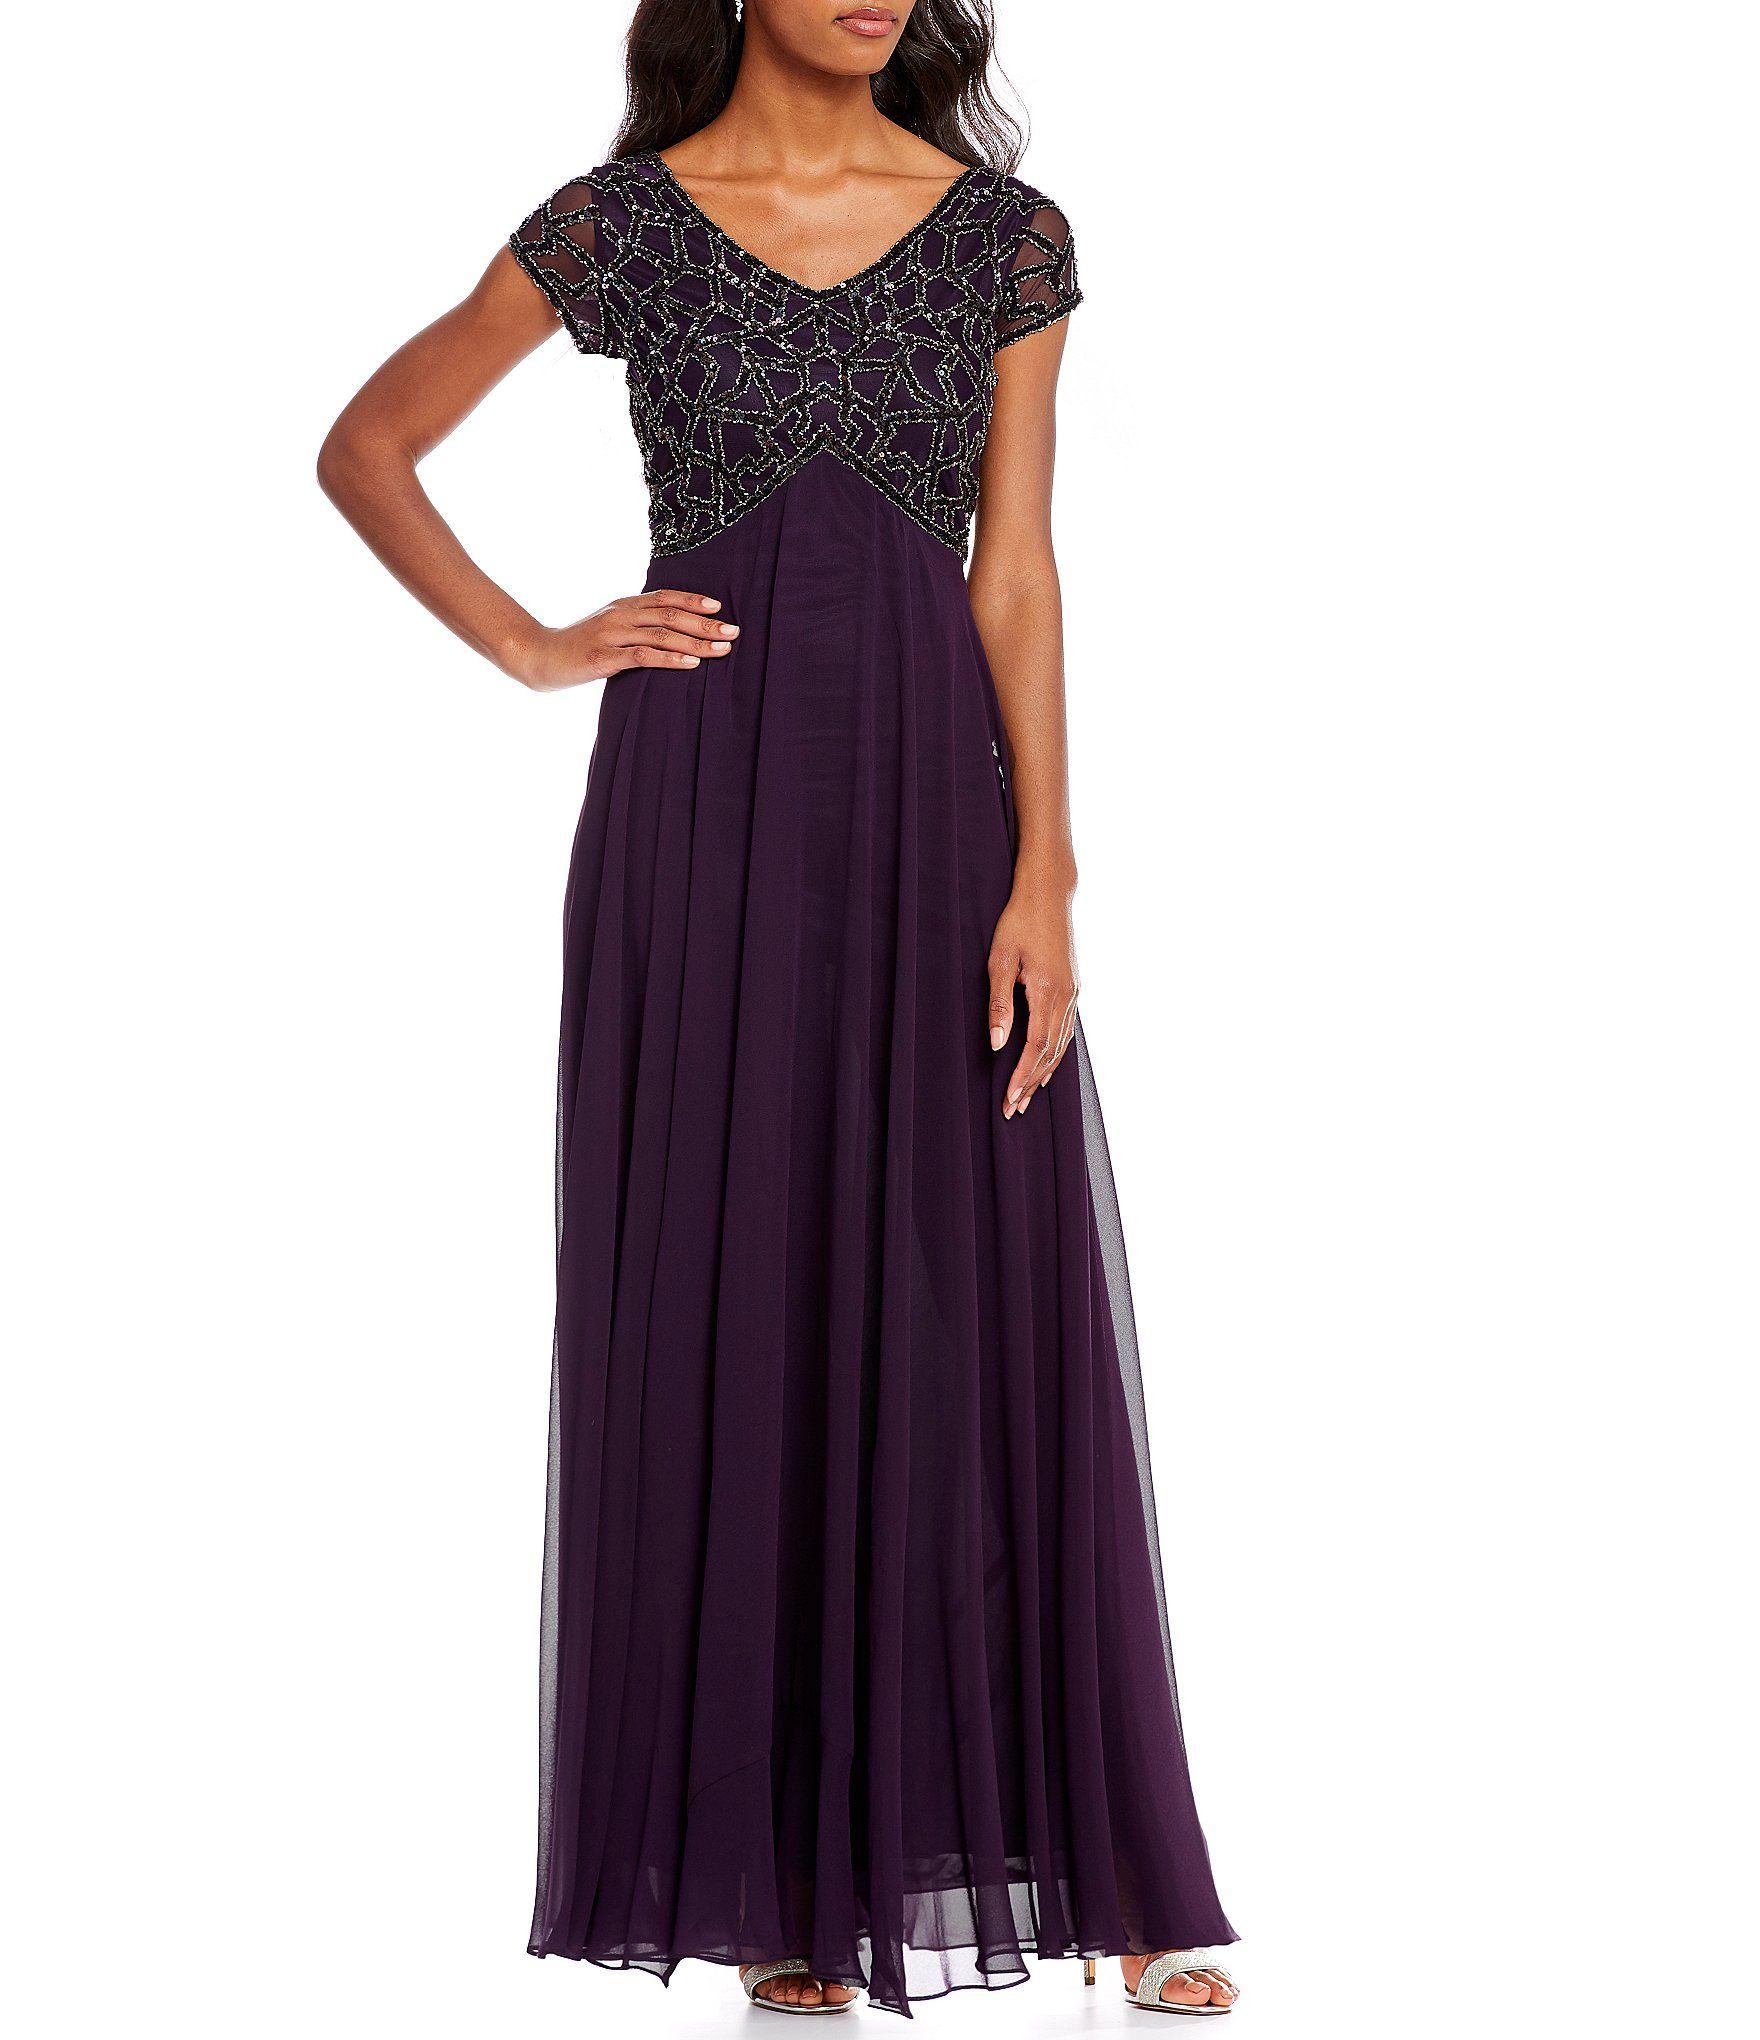 Jkara V-Neck Beaded Top Bodice Column Gown #Dillards | wedding 2018 ...